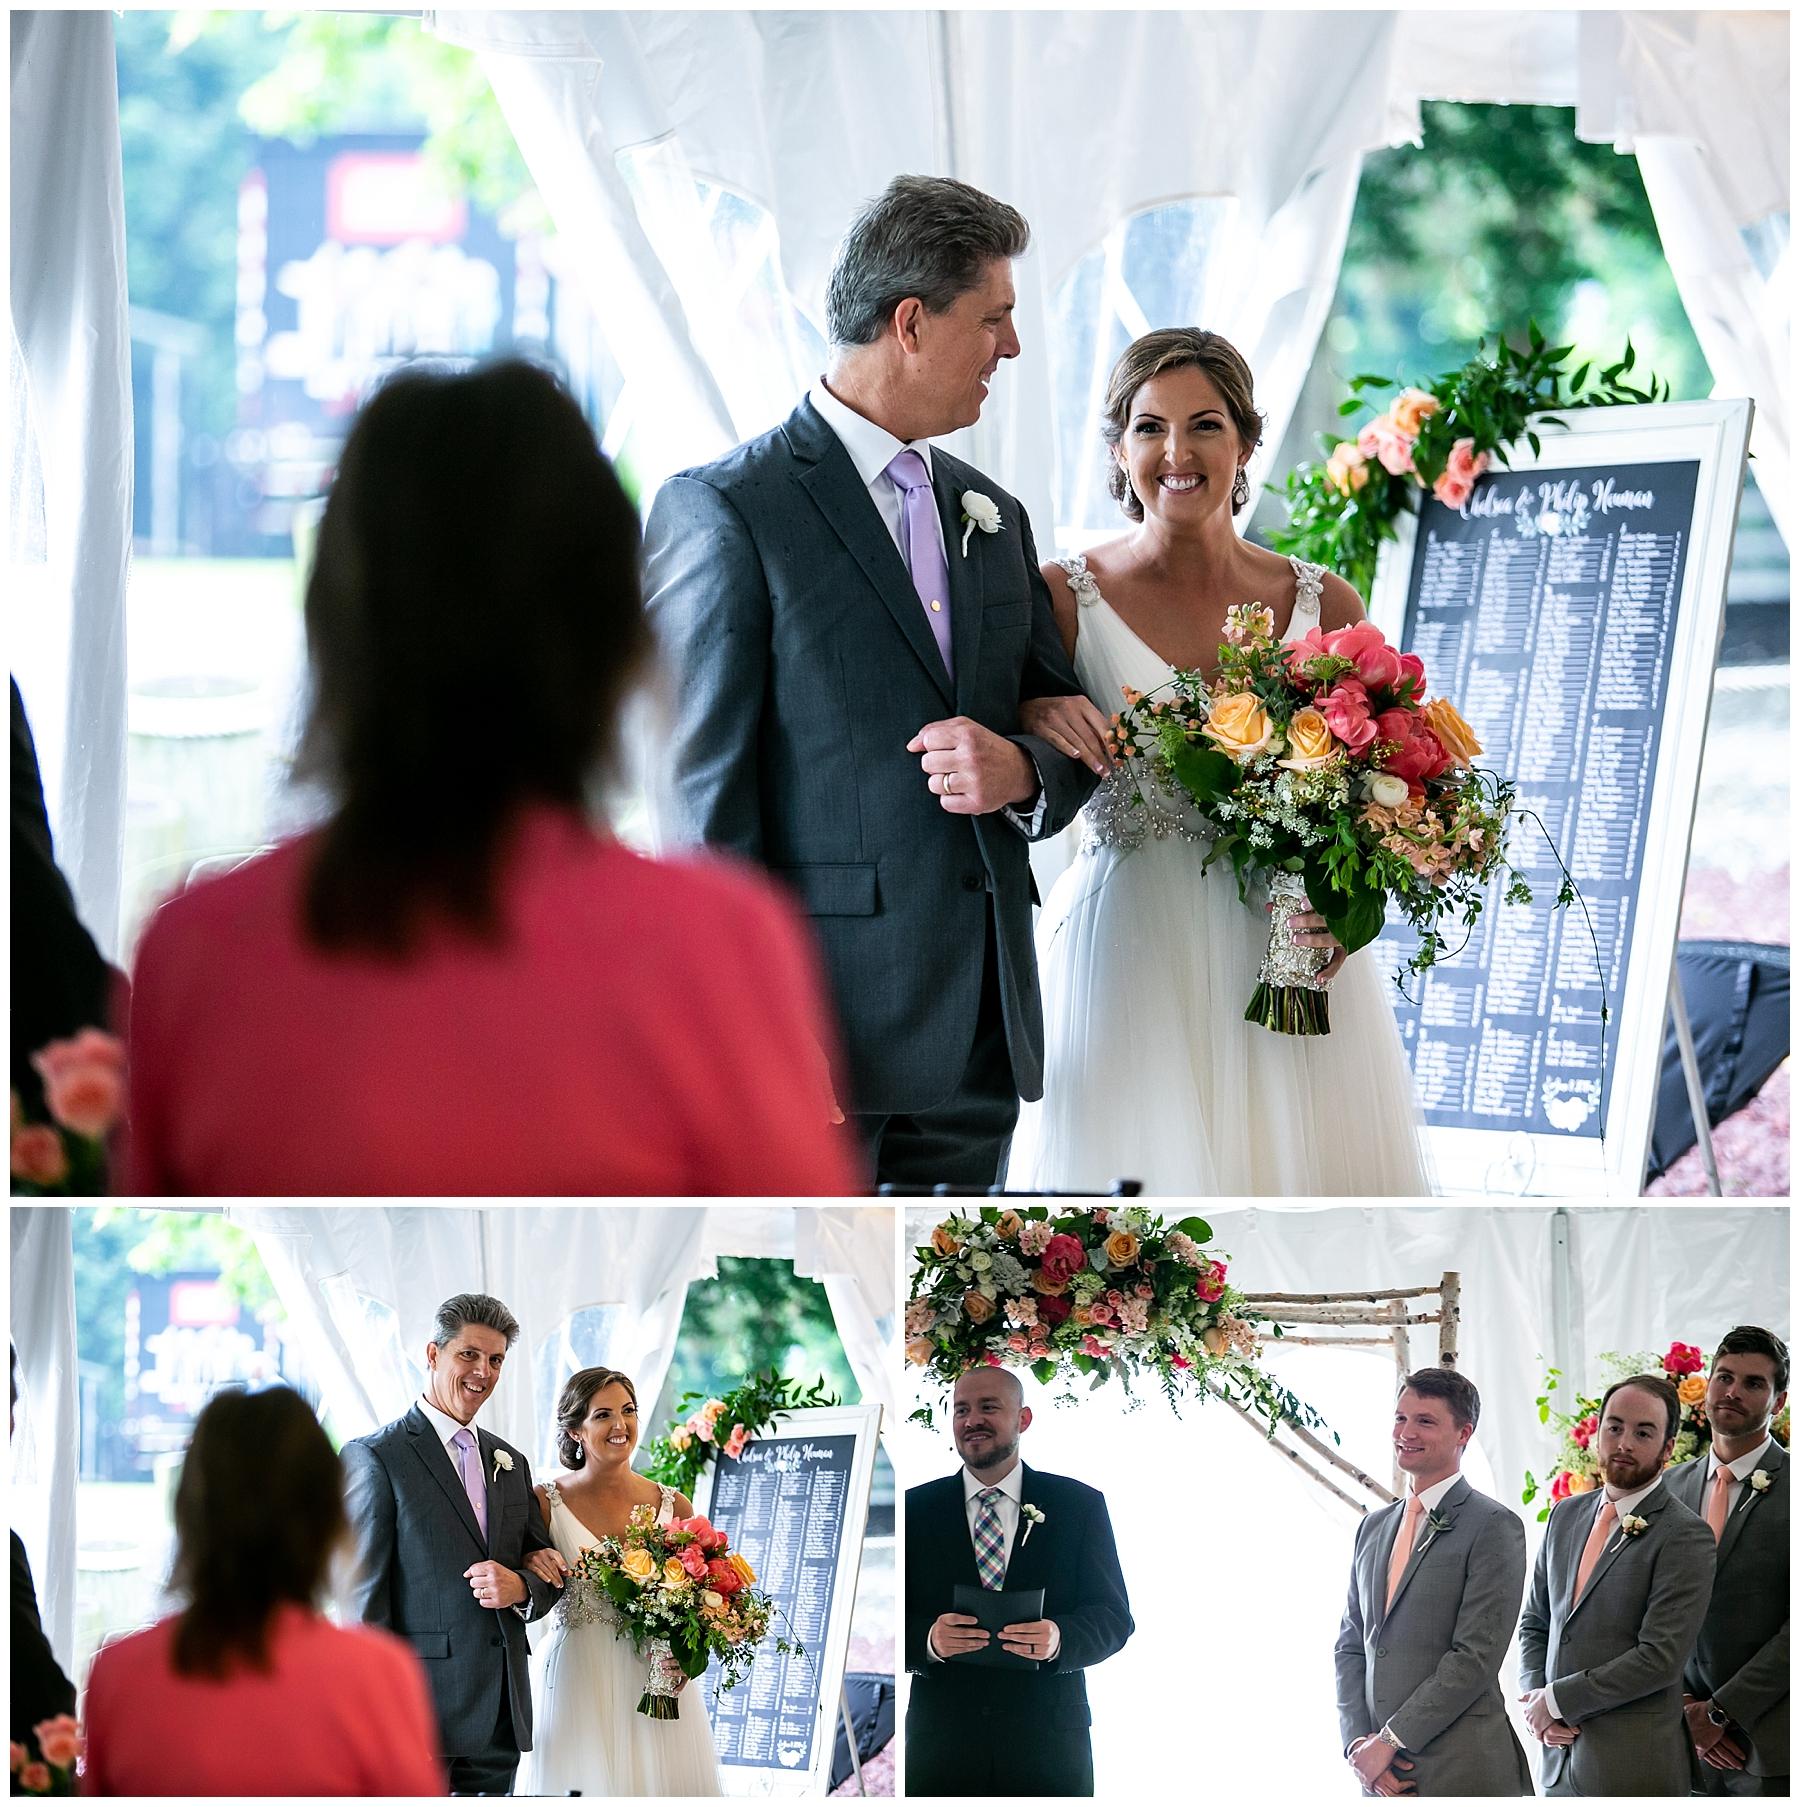 Chelsea Phil Bohemia River Overlook Wedding Living Radiant Photography photos_0103.jpg